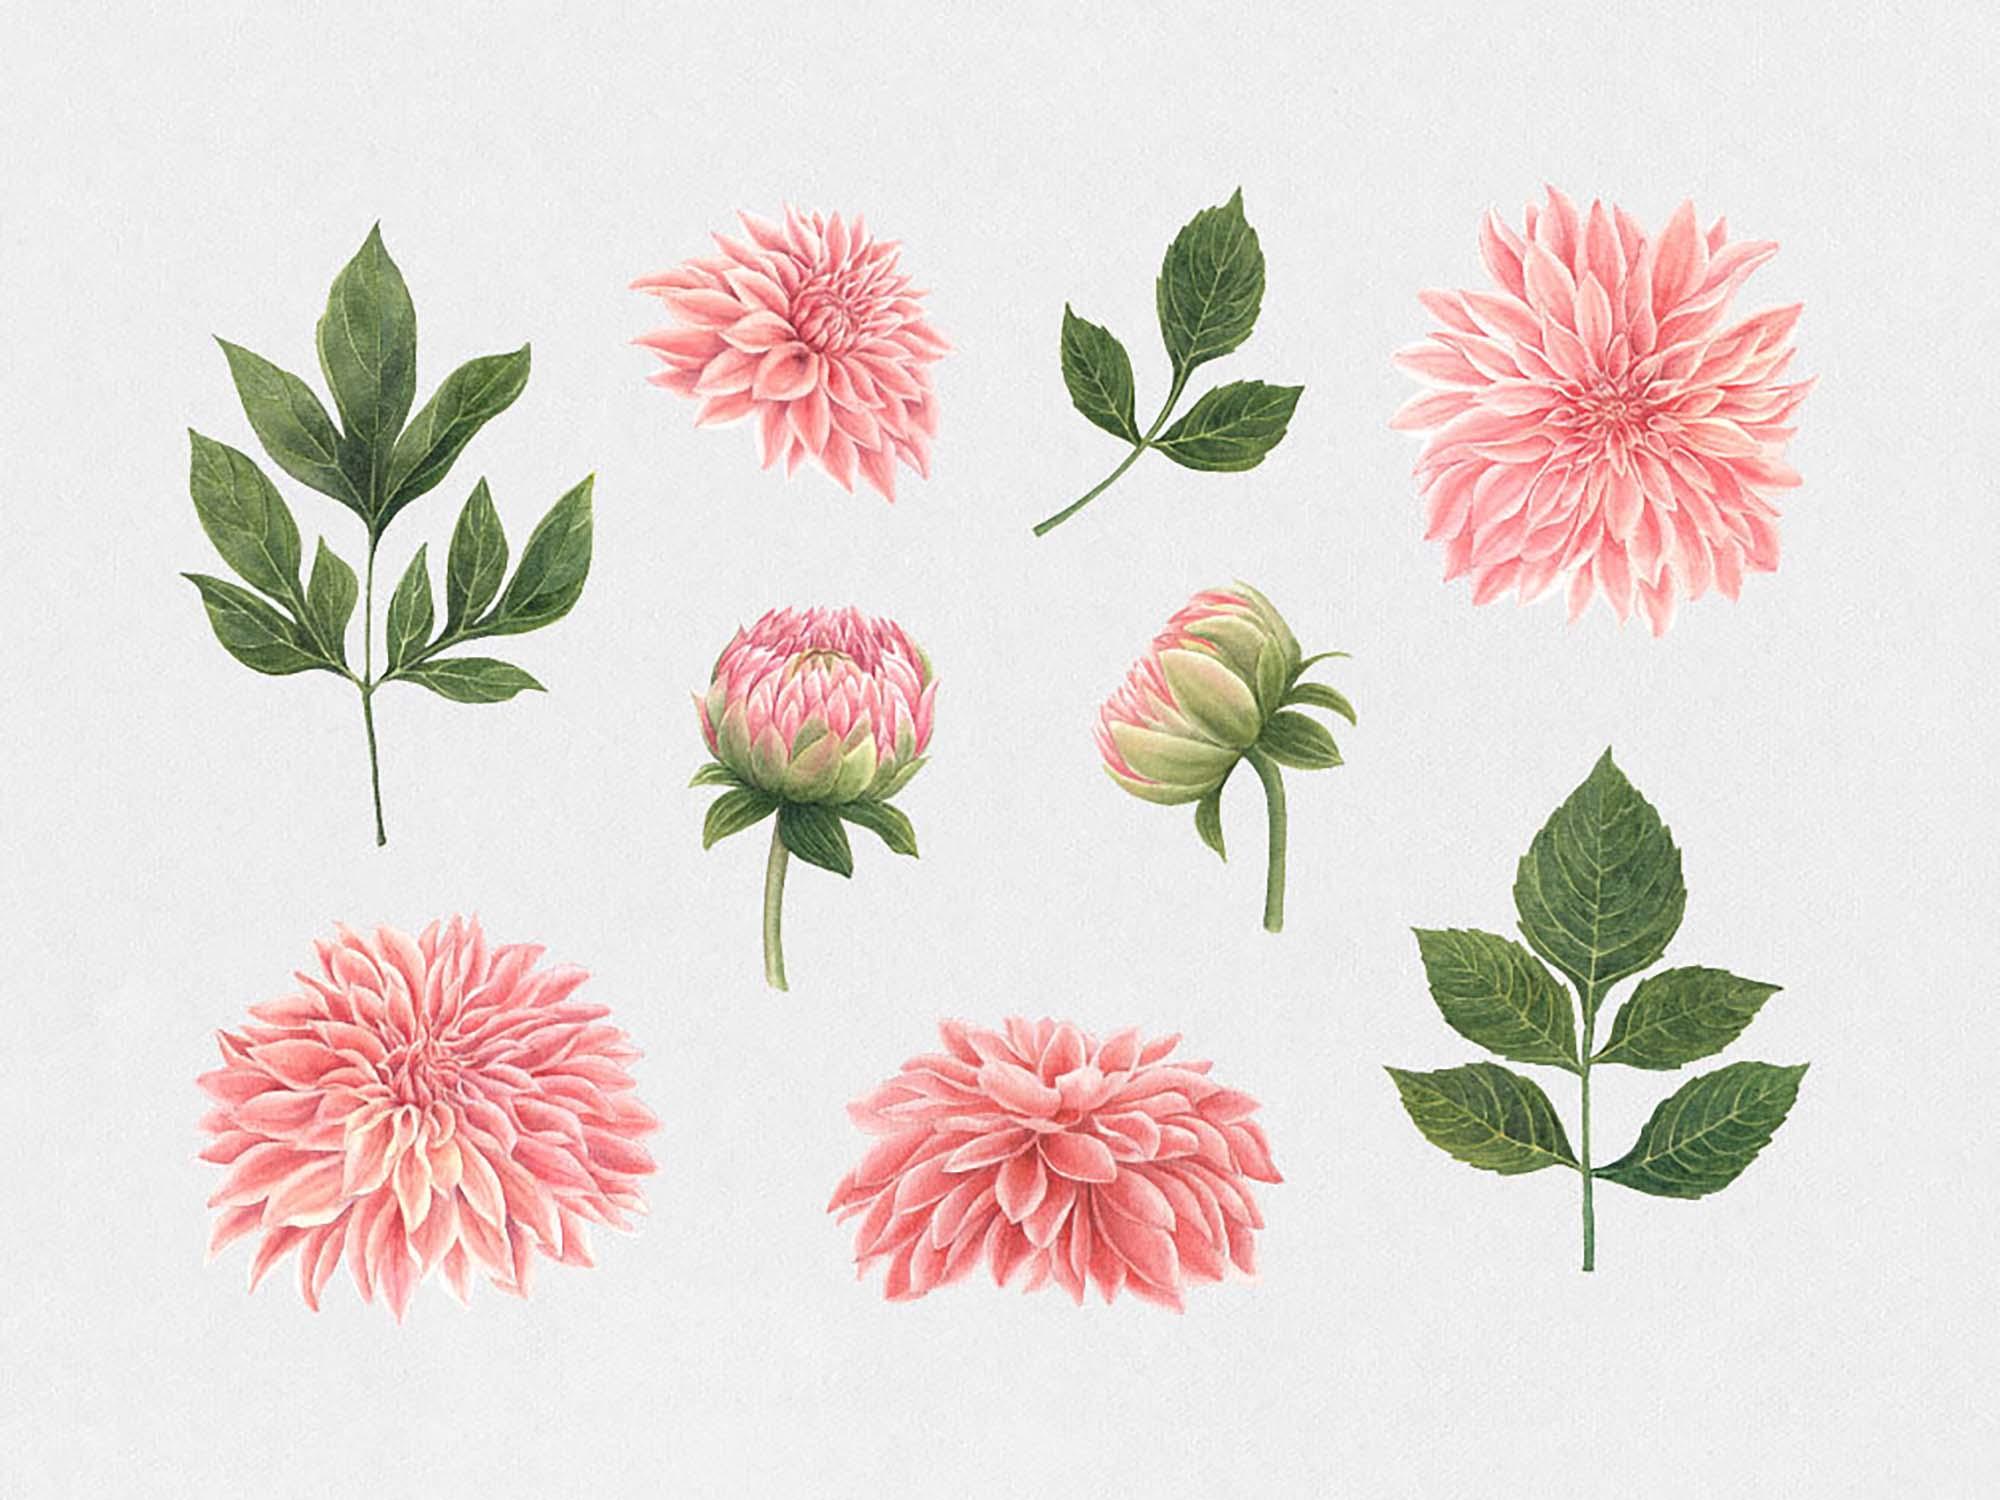 Anemone & Dahlia Flowers Clipart 2